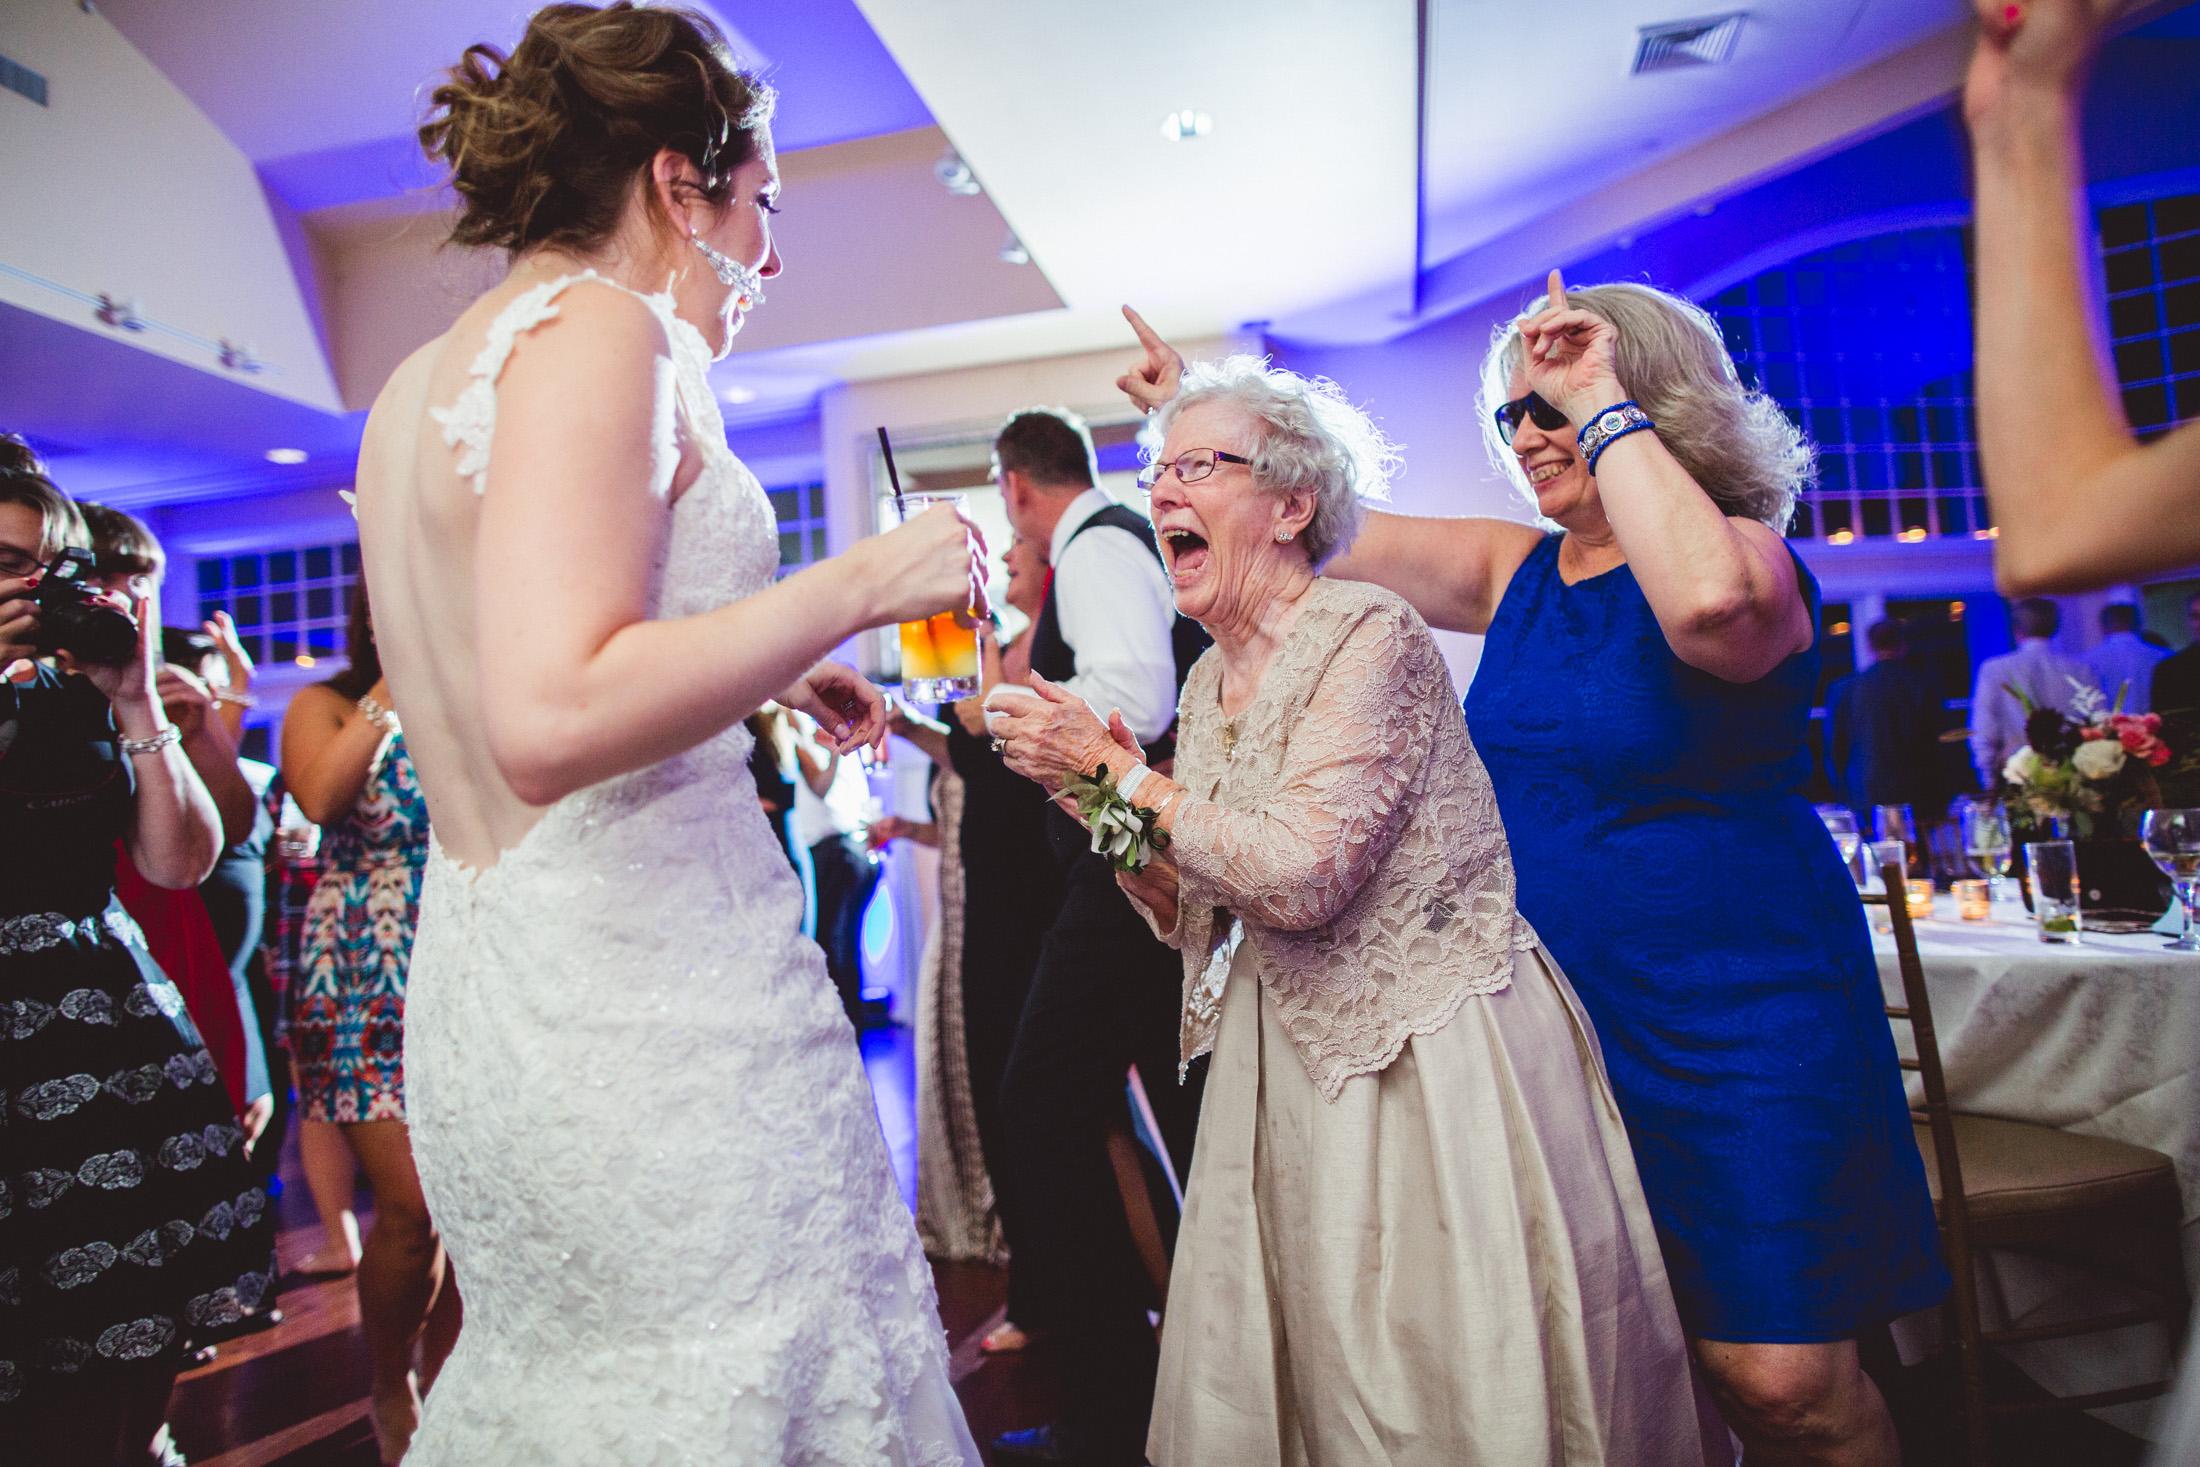 Cruiseport-Wedding-Photographer-56.jpg